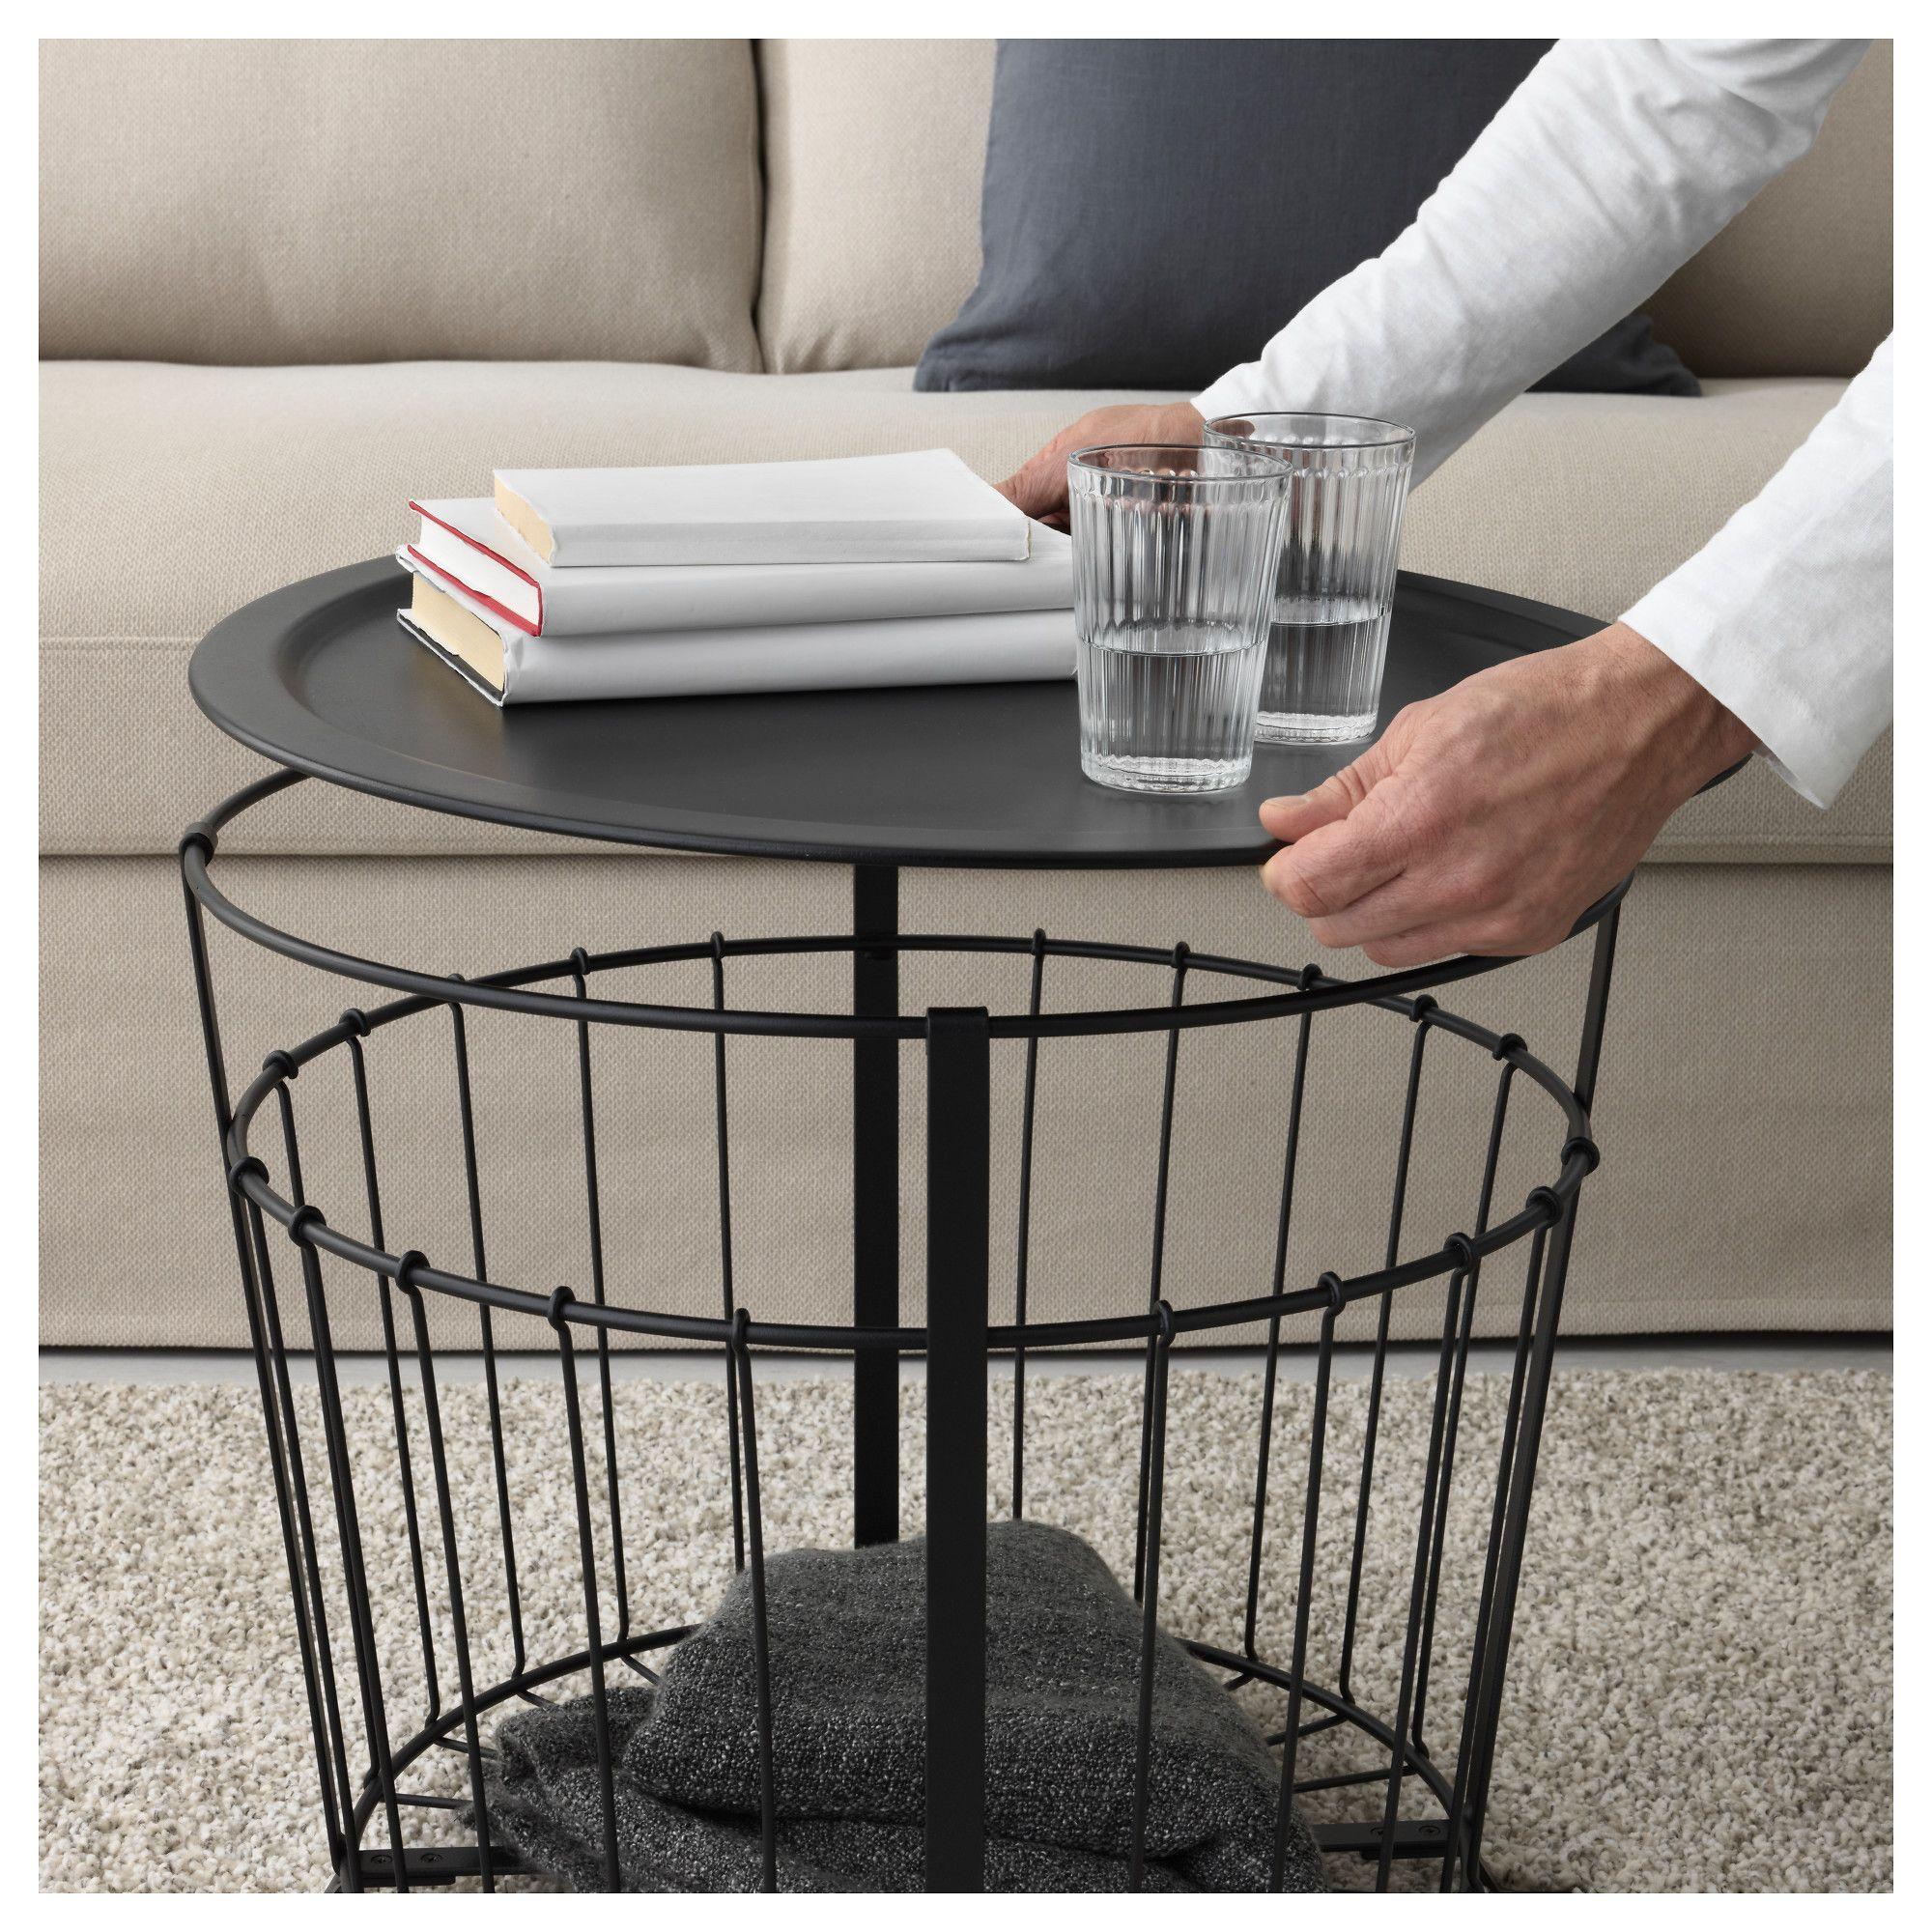 Gualov Storage Table Black 235 8 60 Cm Ikea In 2021 Table Storage Blanket Storage Living Room Blanket Storage Basket [ 2000 x 2000 Pixel ]